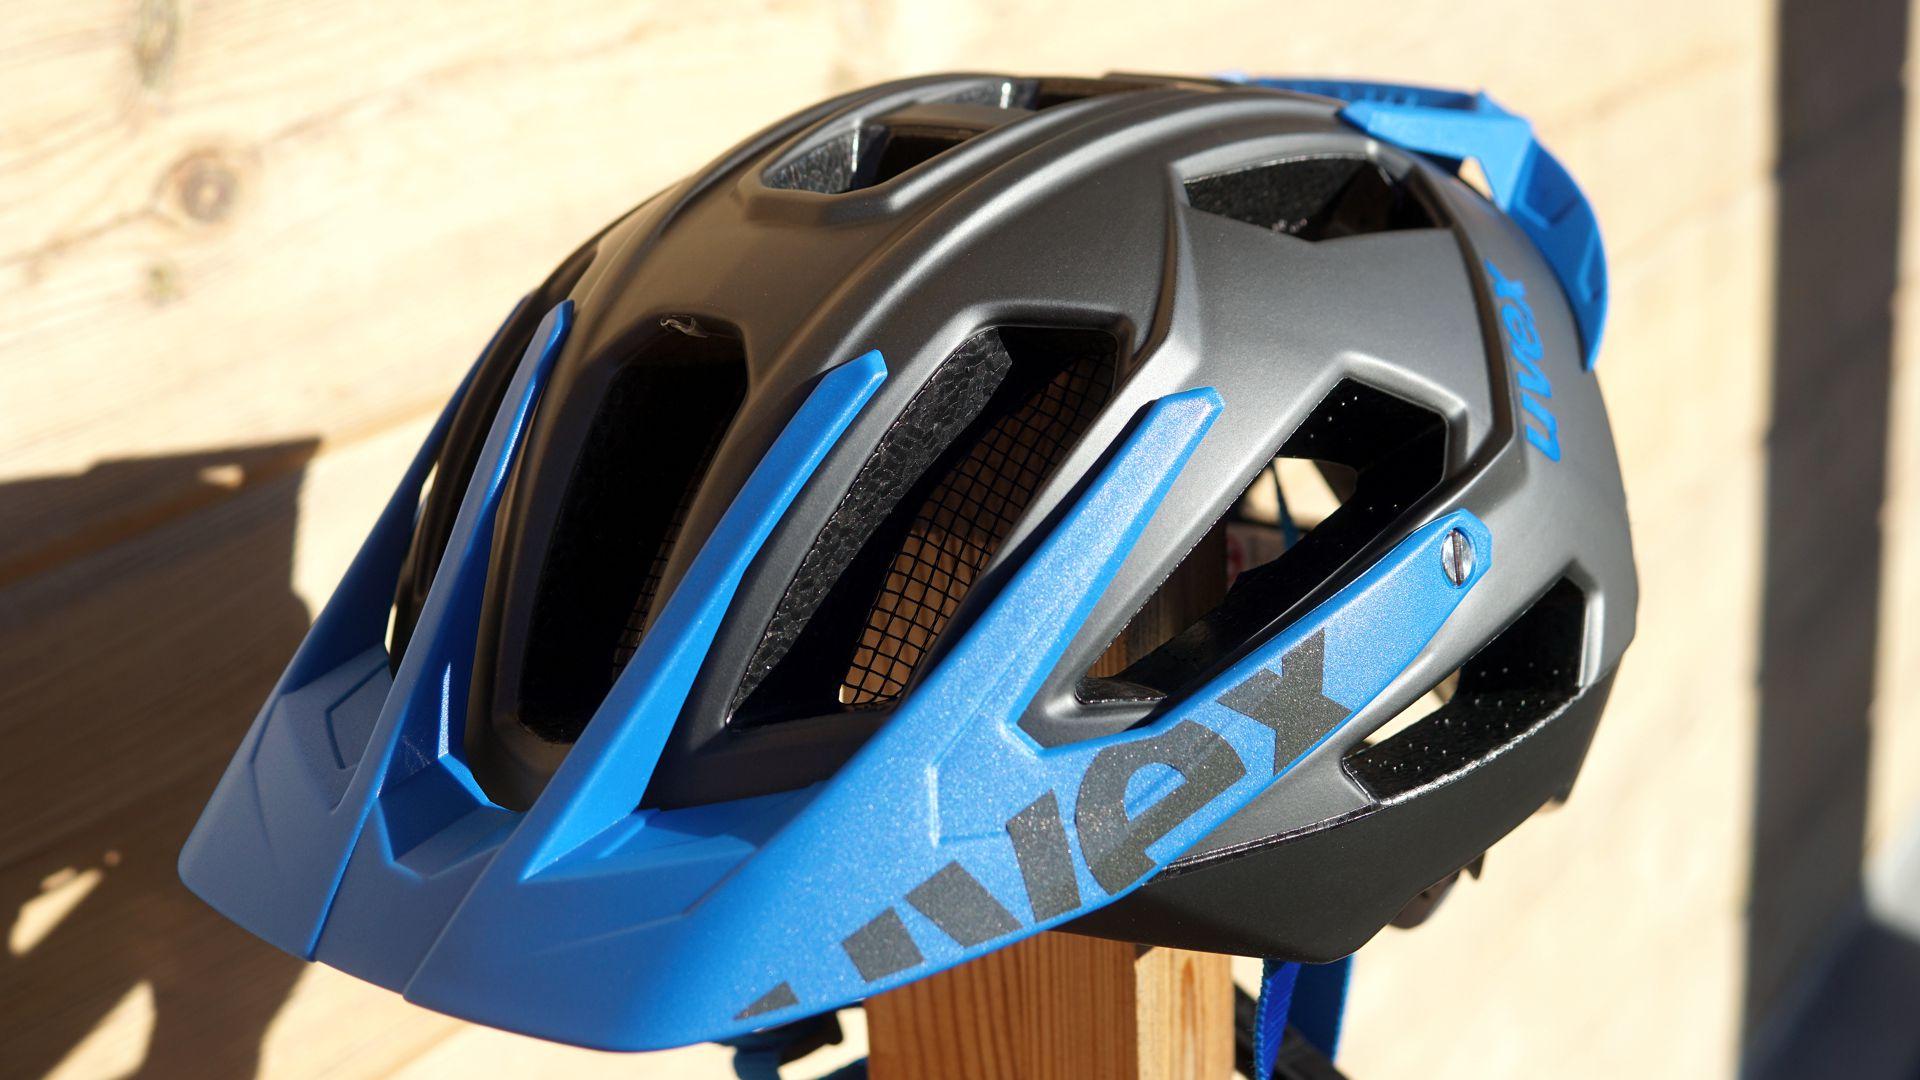 uvex quatro pro ein allround helm prime mountainbiking. Black Bedroom Furniture Sets. Home Design Ideas